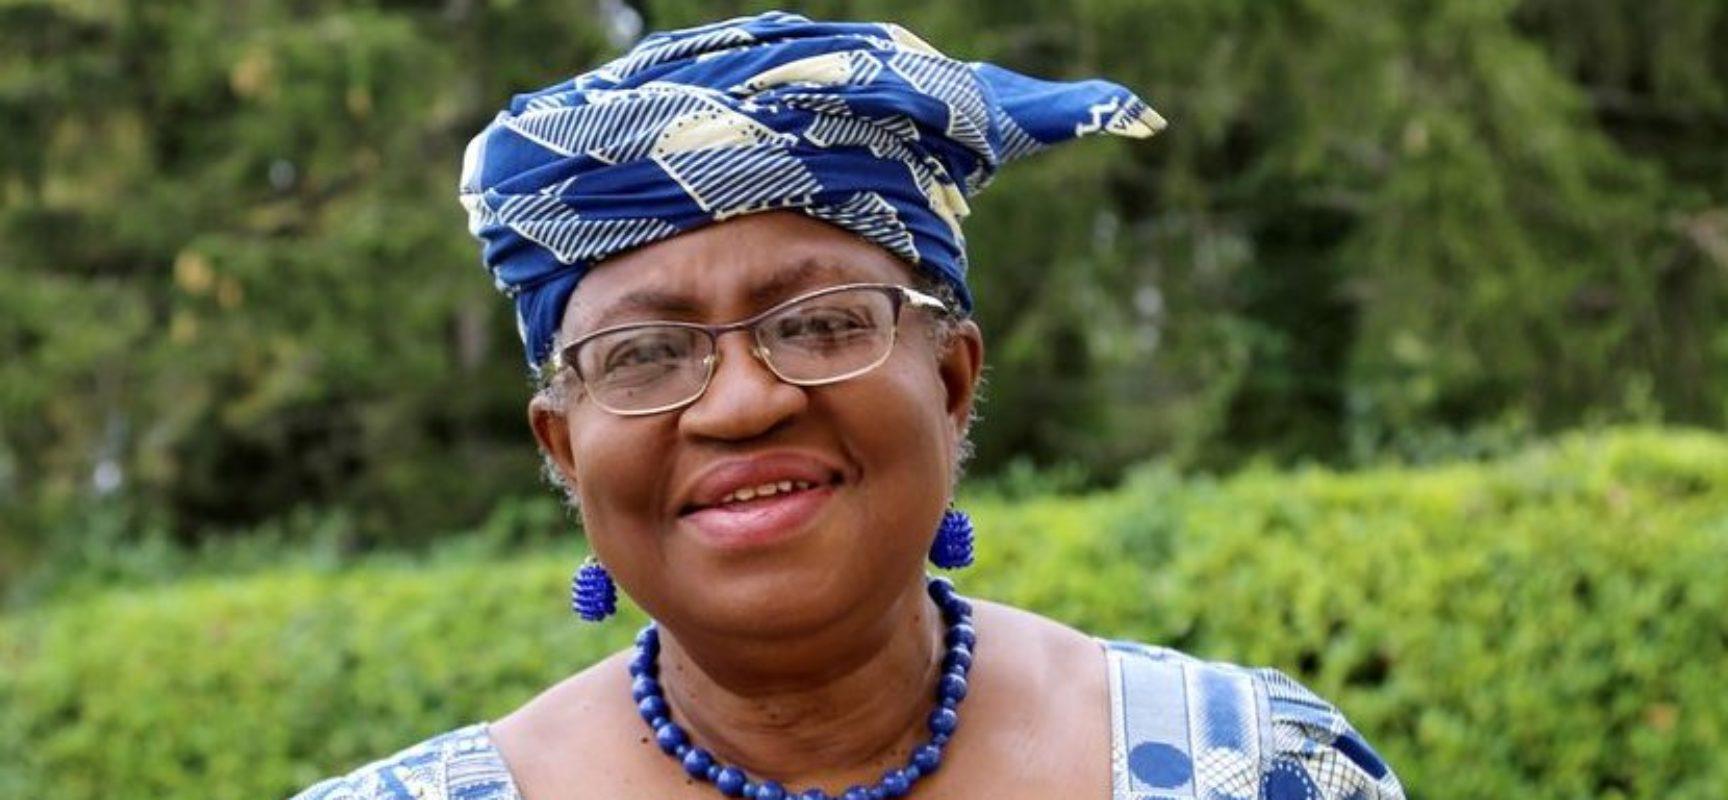 Nigeriana Ngozi Okonjo-Iweala torna-se primeira mulher a liderar OMC